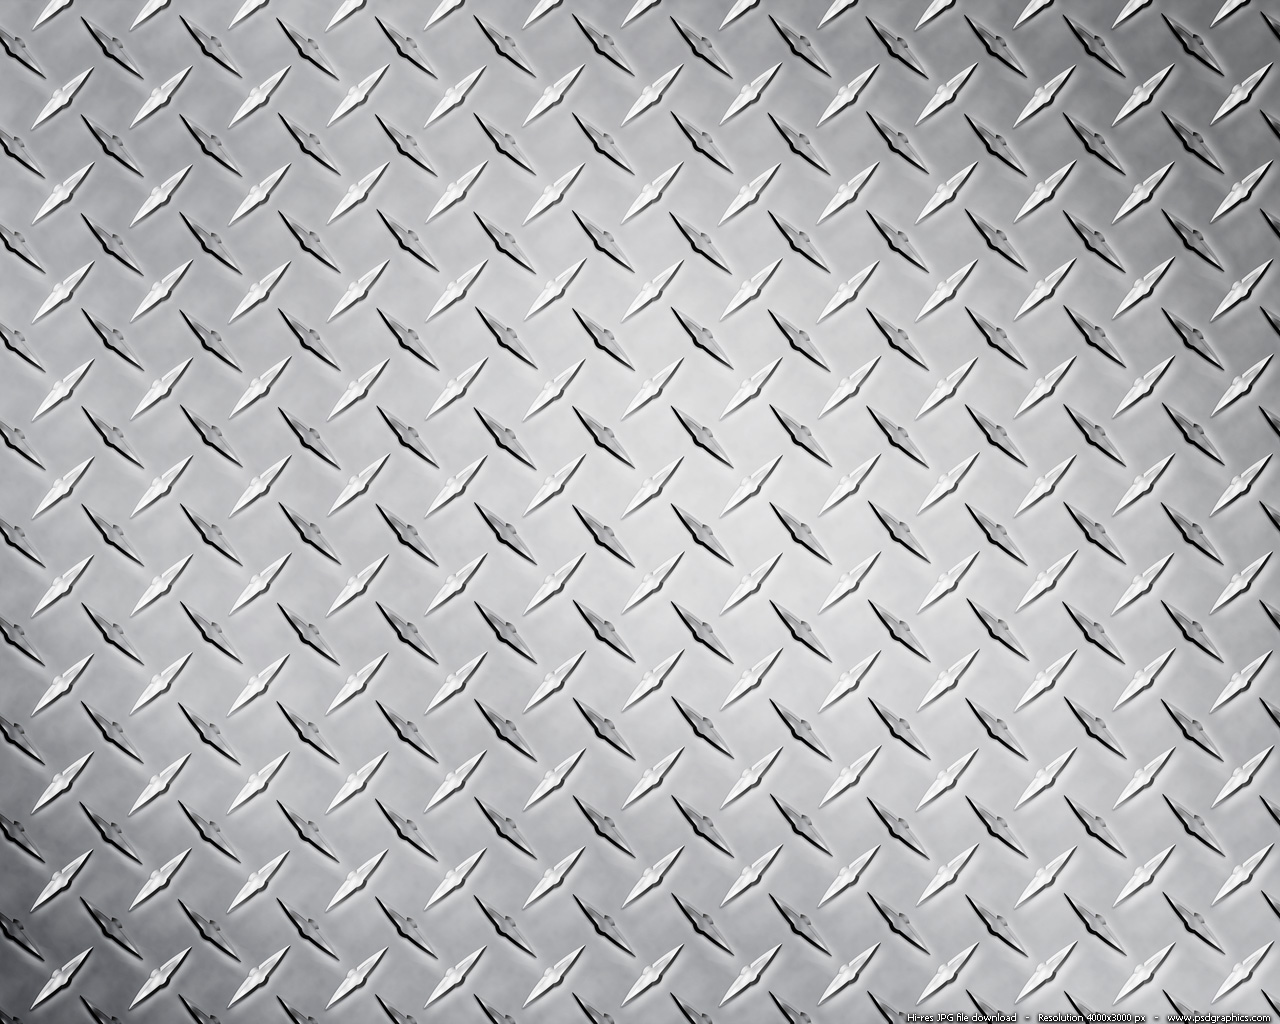 Metal diamond plate texture PSDGraphics 1280x1024